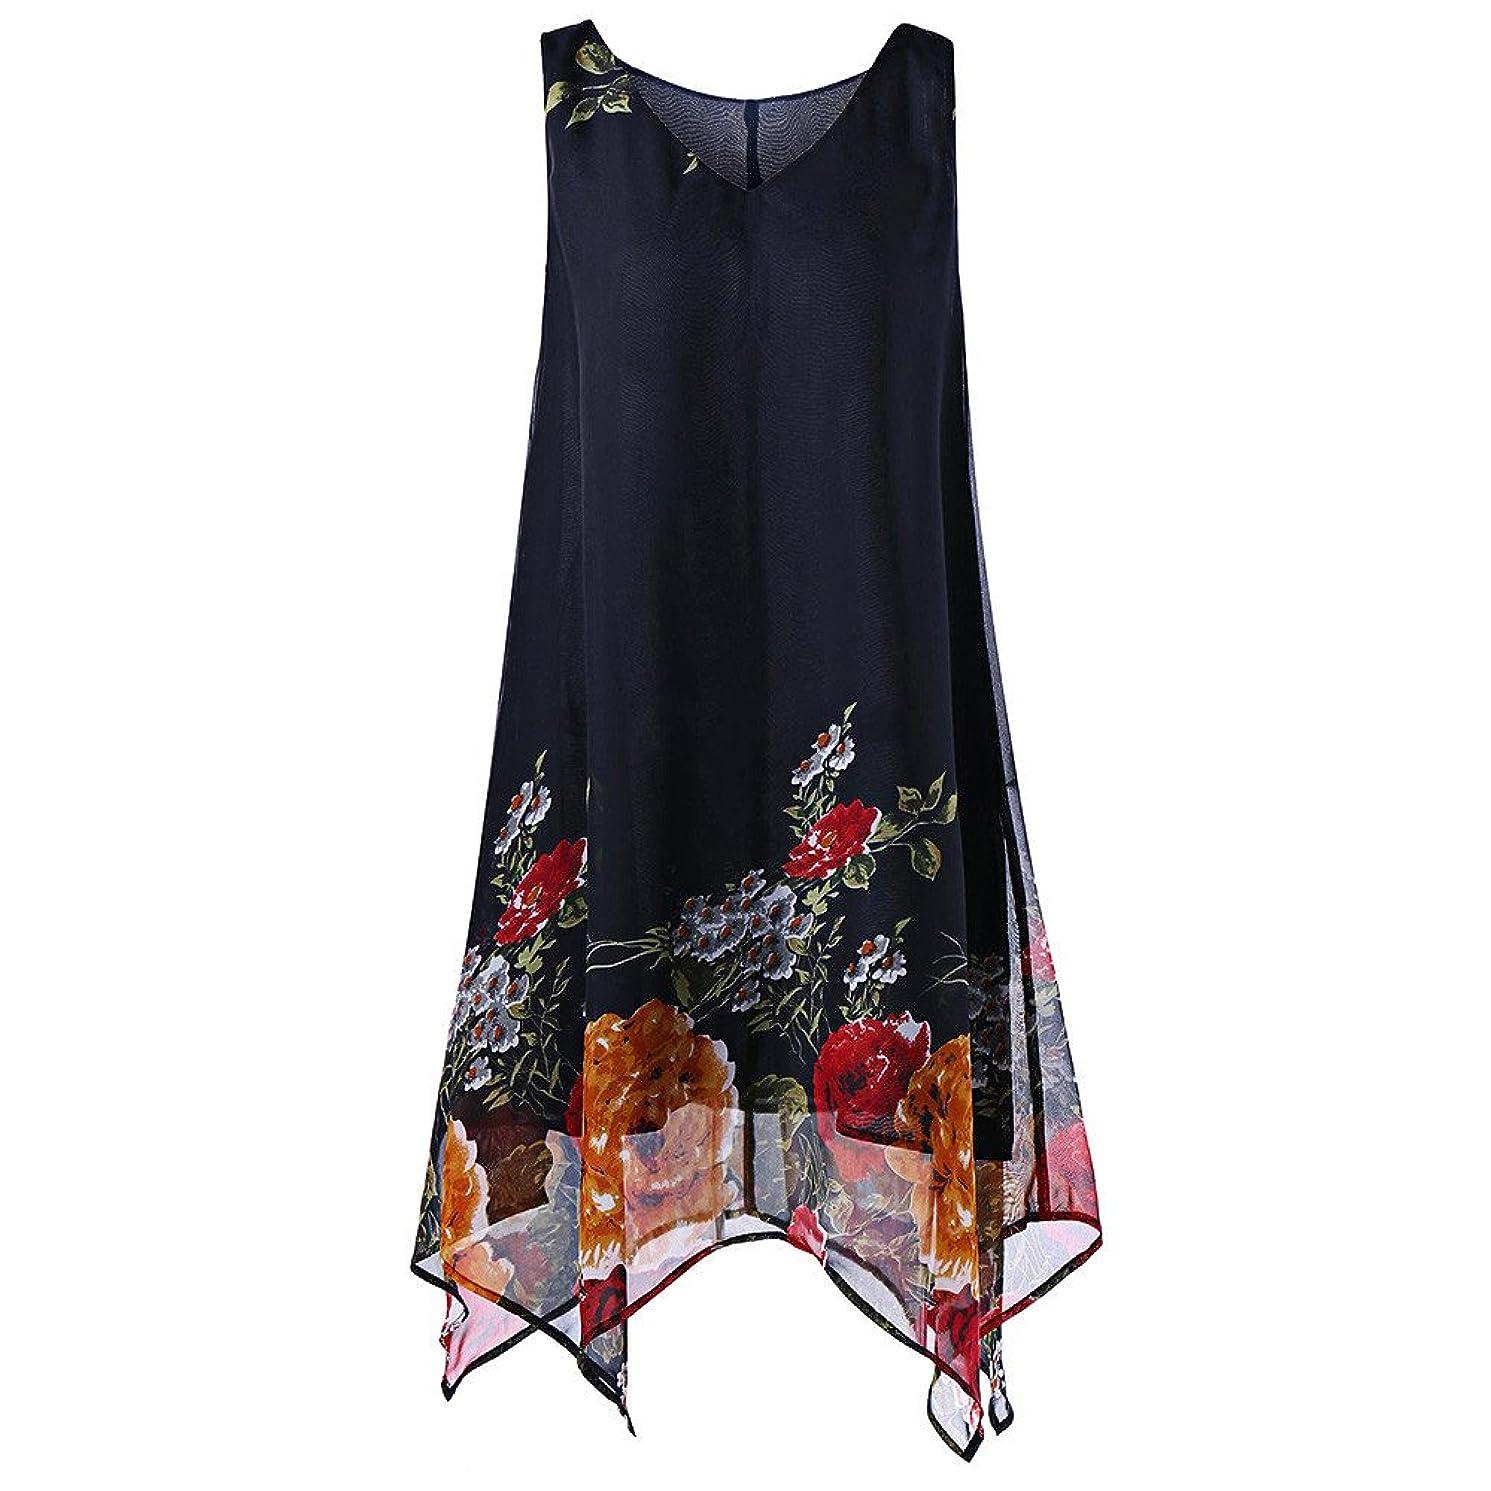 ????Womens Shirts Print Irregular Sleeveless Casual Tunic Tops Blouse T-Shirt for Ladies Teen Girls